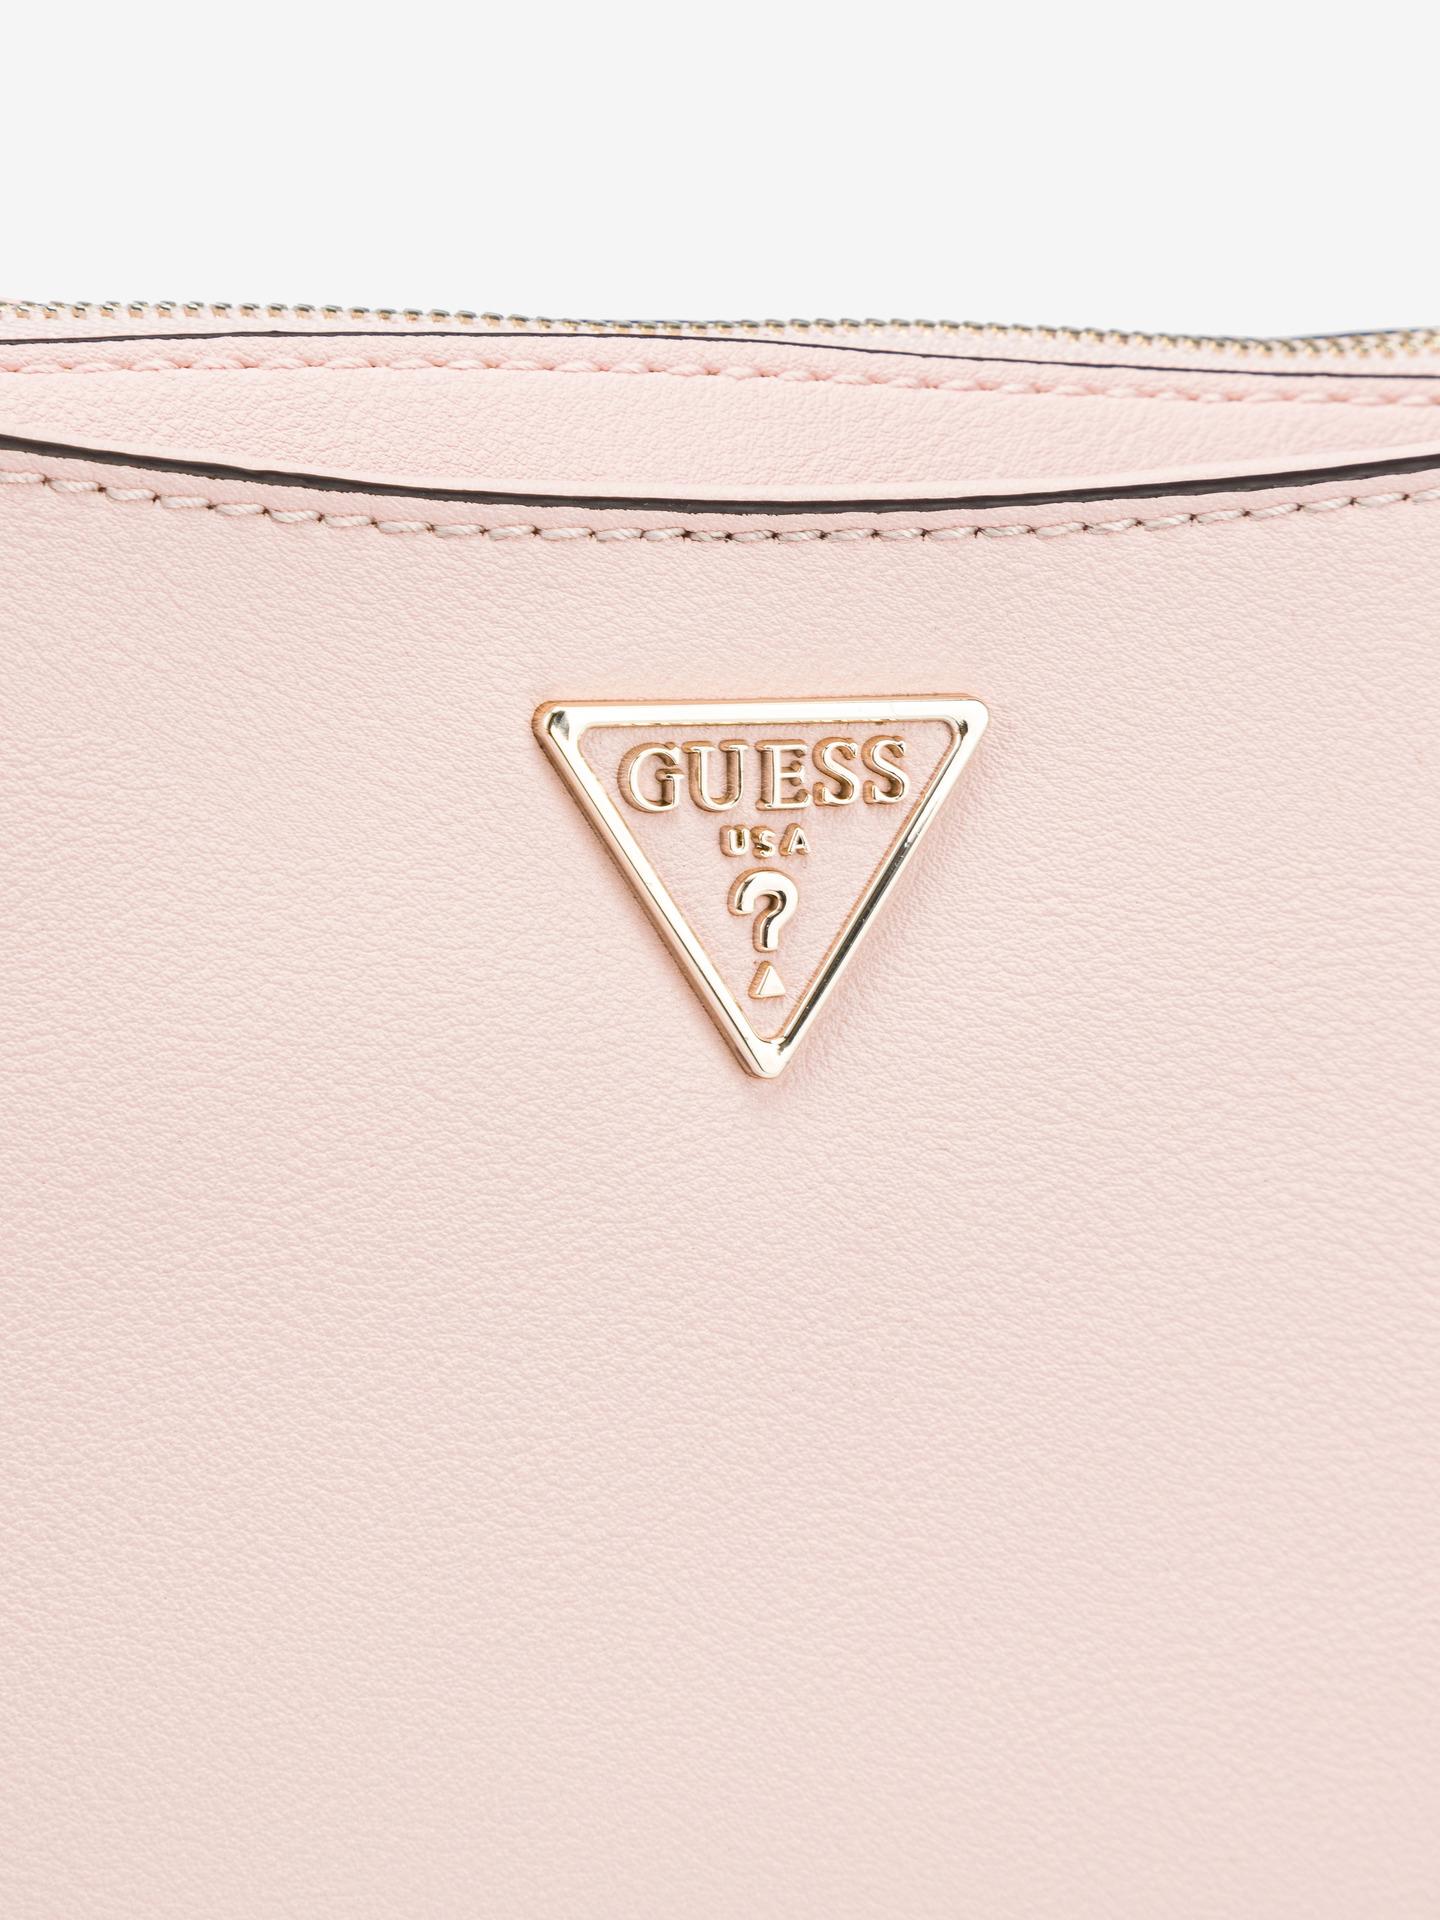 Guess pink crossbody handbag Ambrose